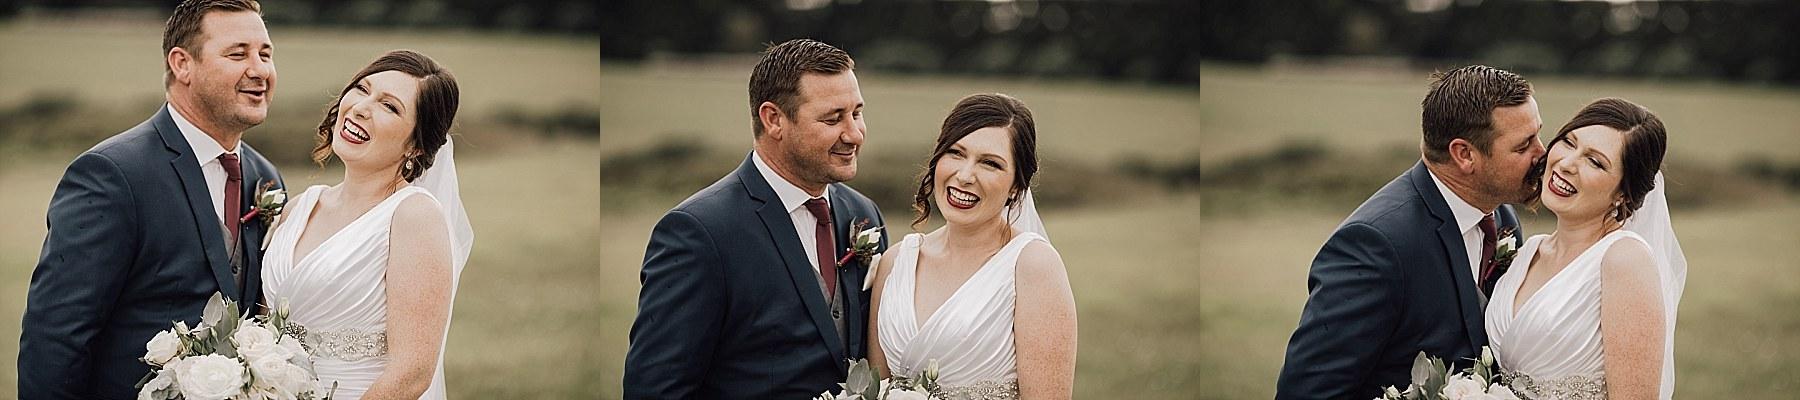 Allely Estate Wedding Auckland Wedding Photographer - Jana & Laurie_0161.jpg